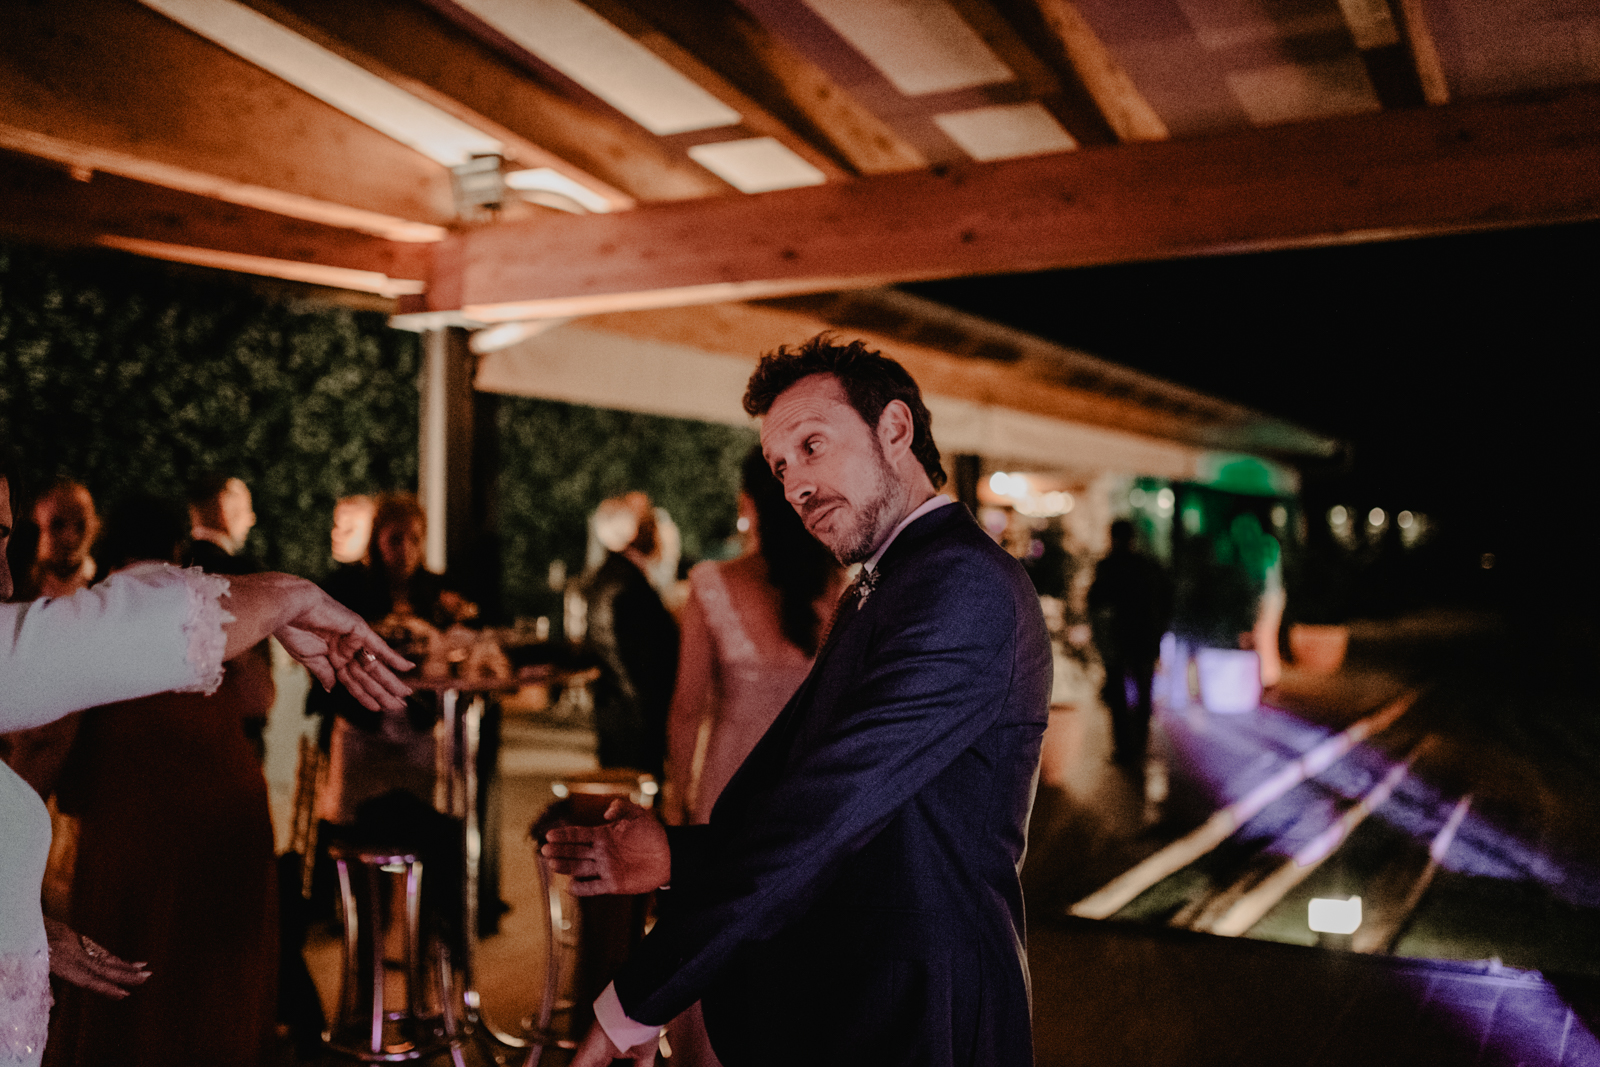 thenortherngirlphotography_photography_thenortherngirl_rebeccascabros_wedding_weddingphotography_weddingphotographer_barcelona_bodaenbarcelona_bodaenmaselmarti_bodarogeryvane-1051.jpg